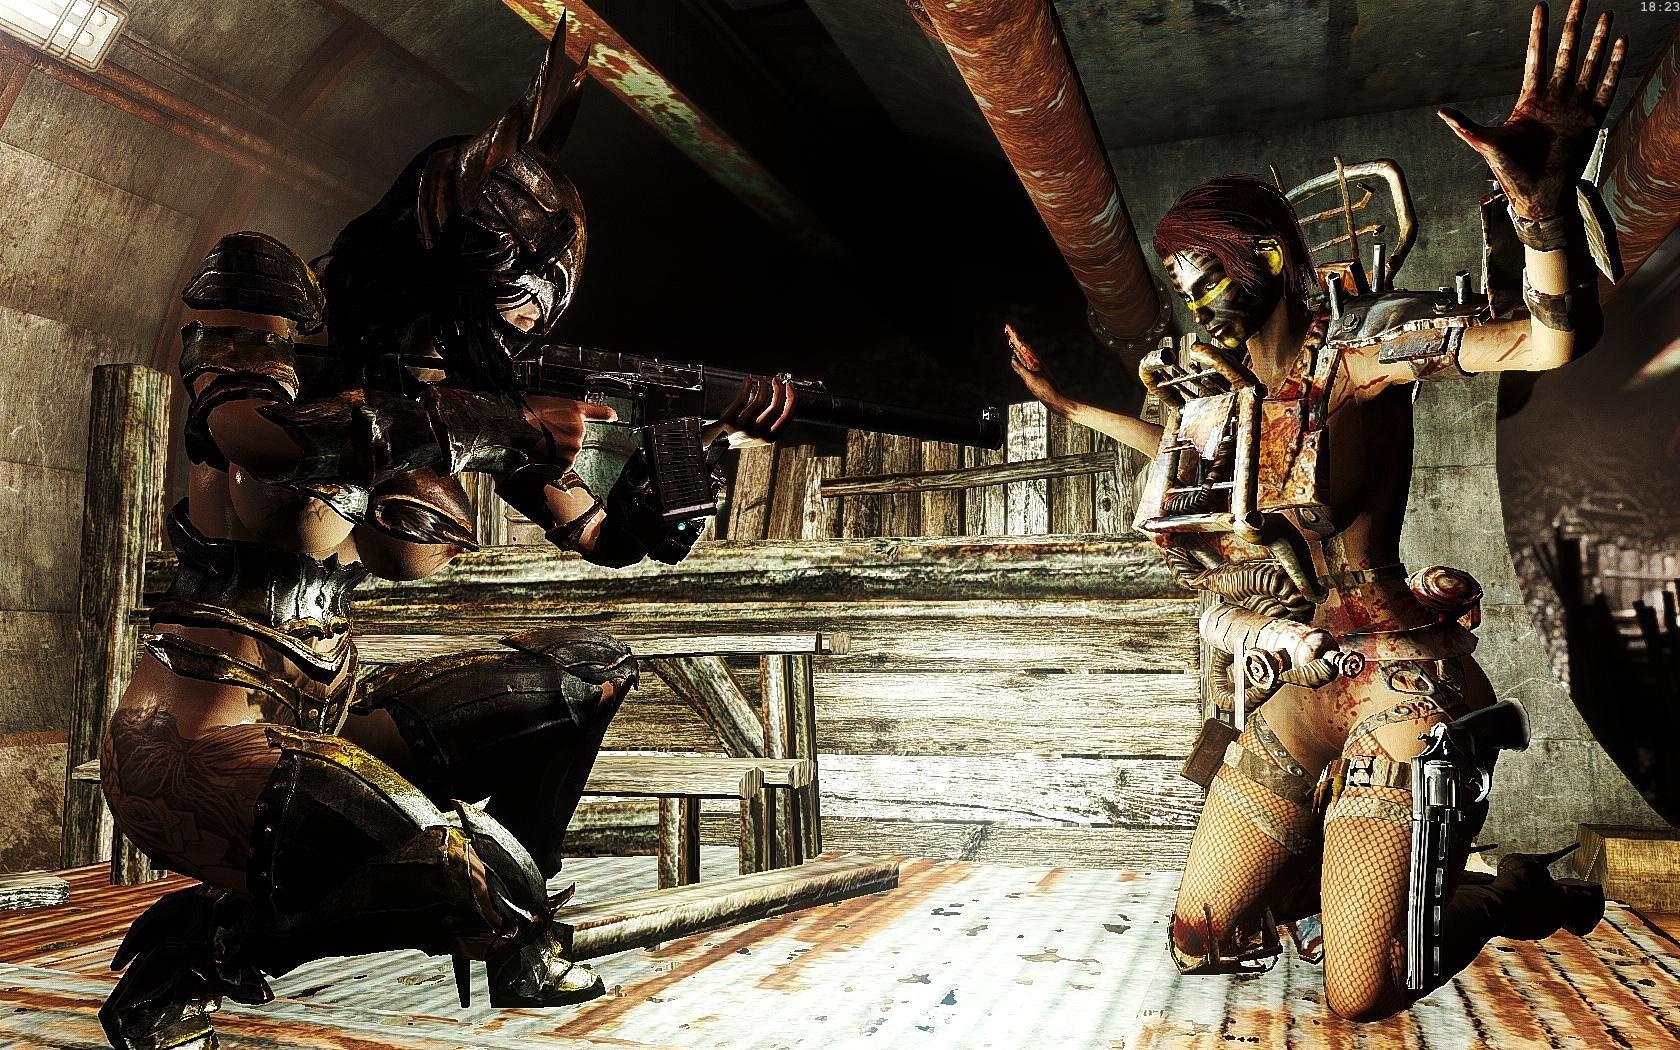 Fallout4 2019-02-05 18-23-23-01